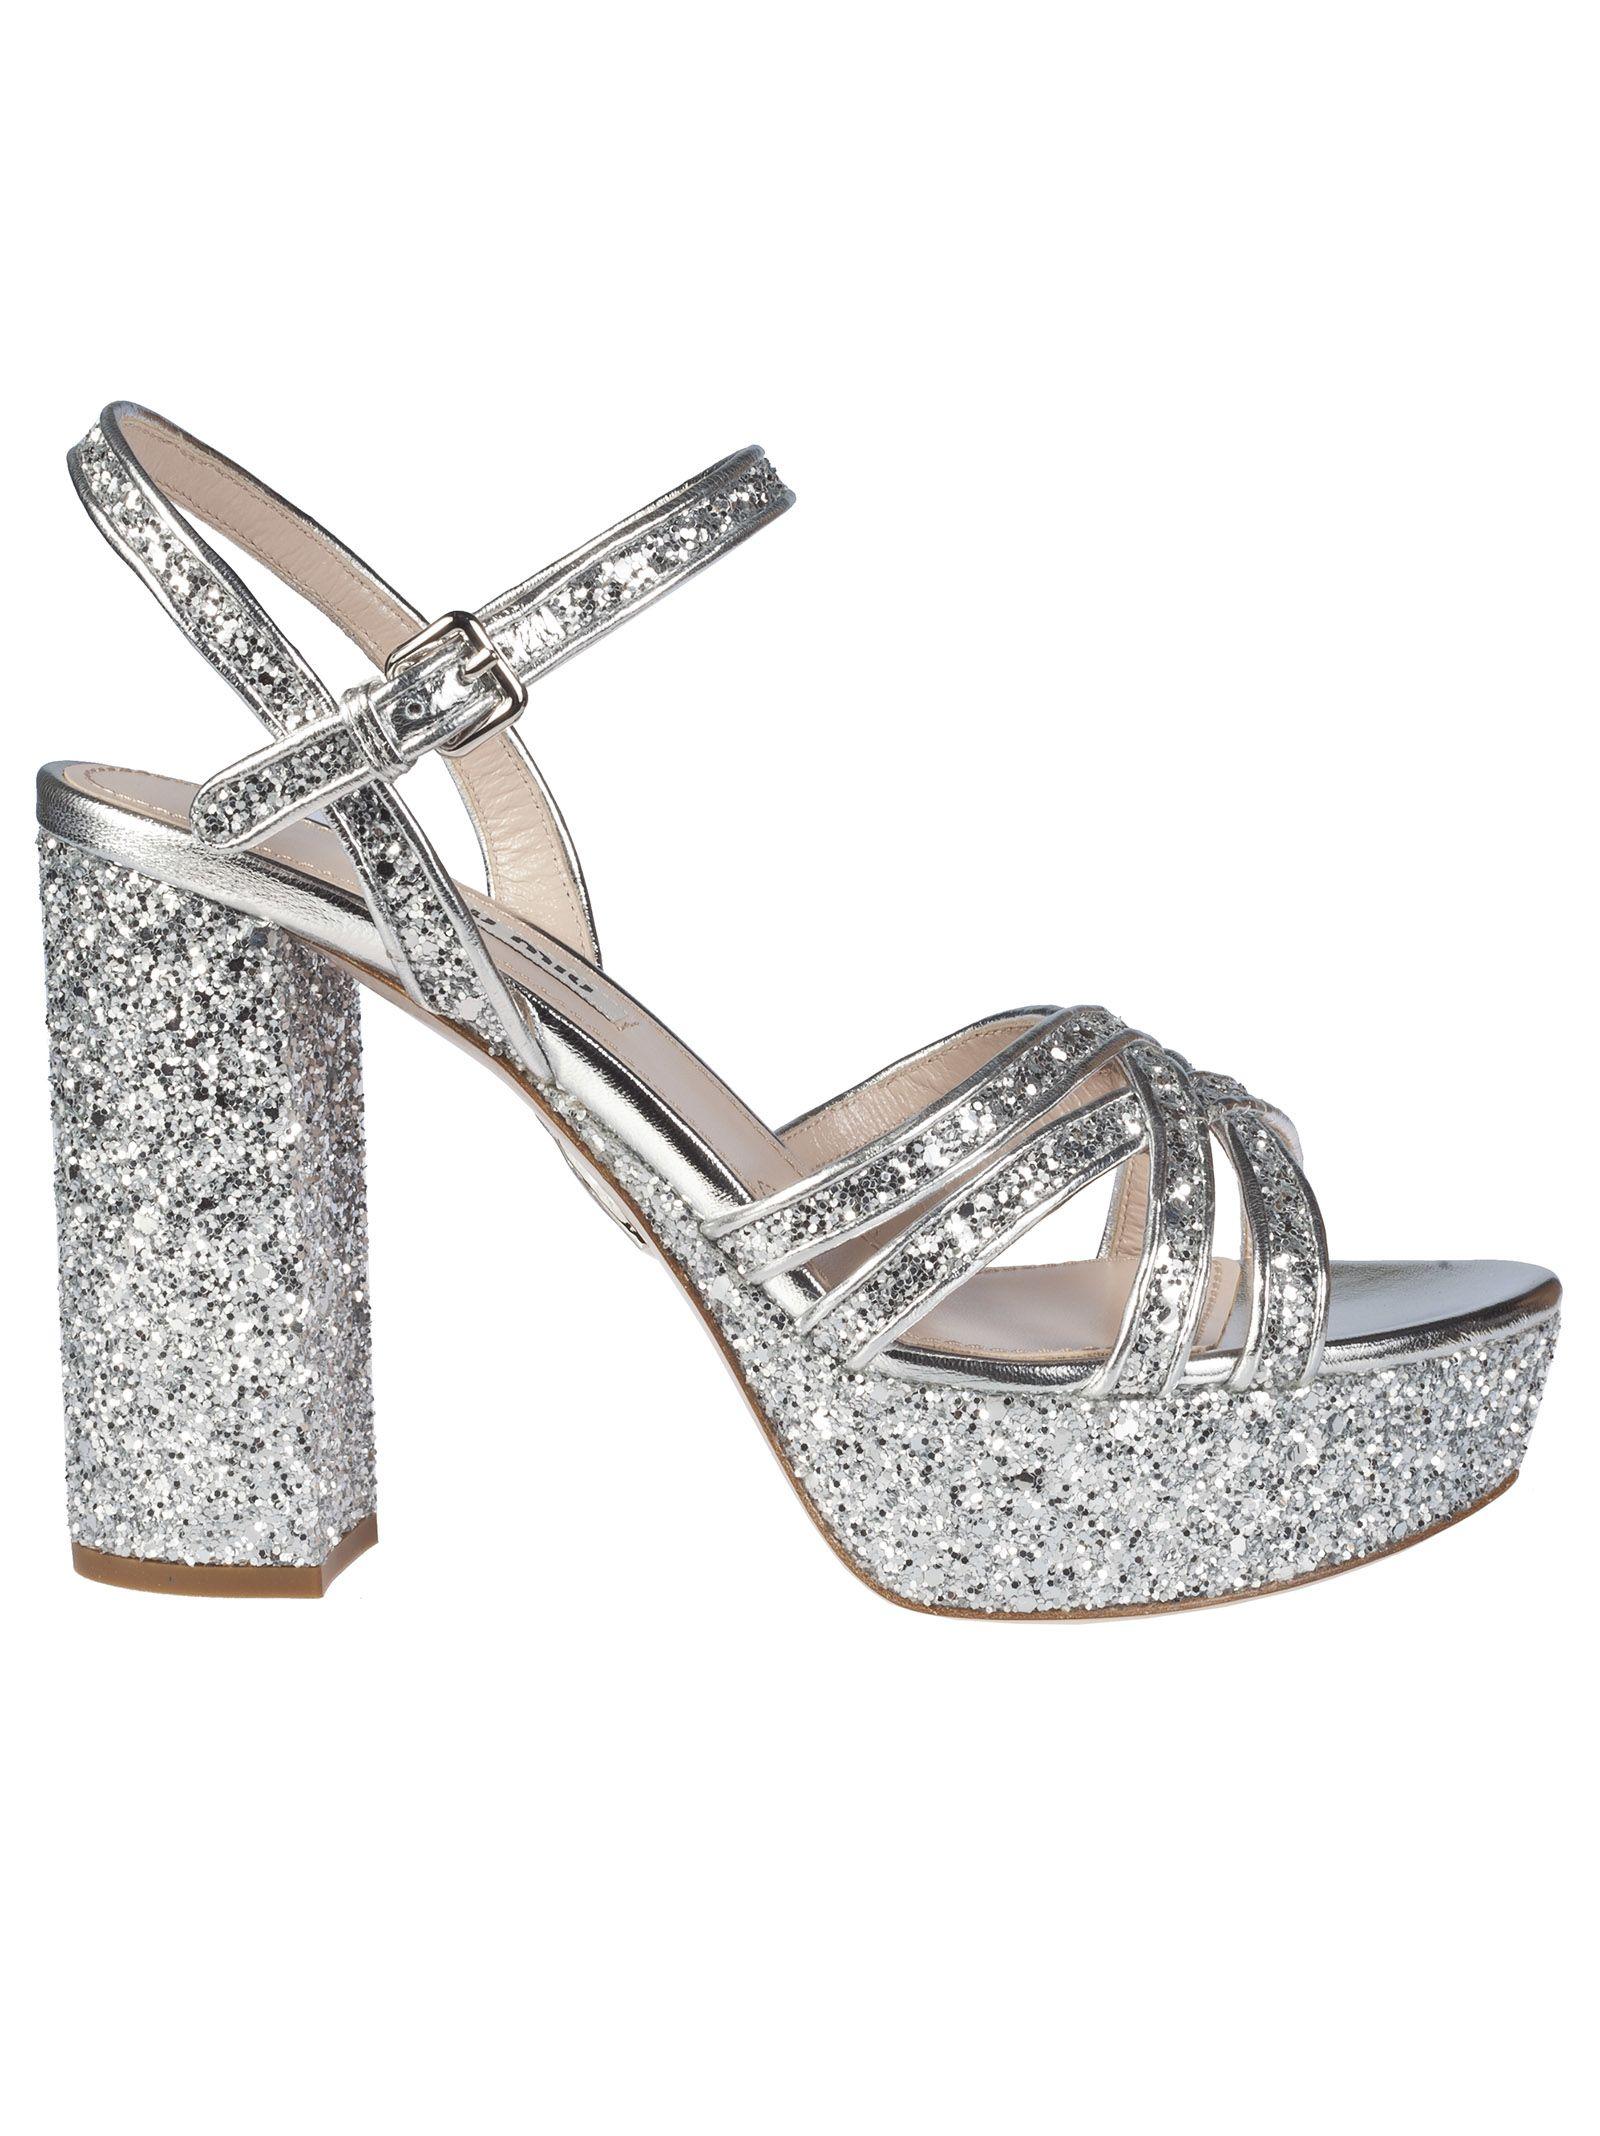 5481675a276 Miu Miu Miu Miu Glitter Platform Sandals - Silver - 10840679